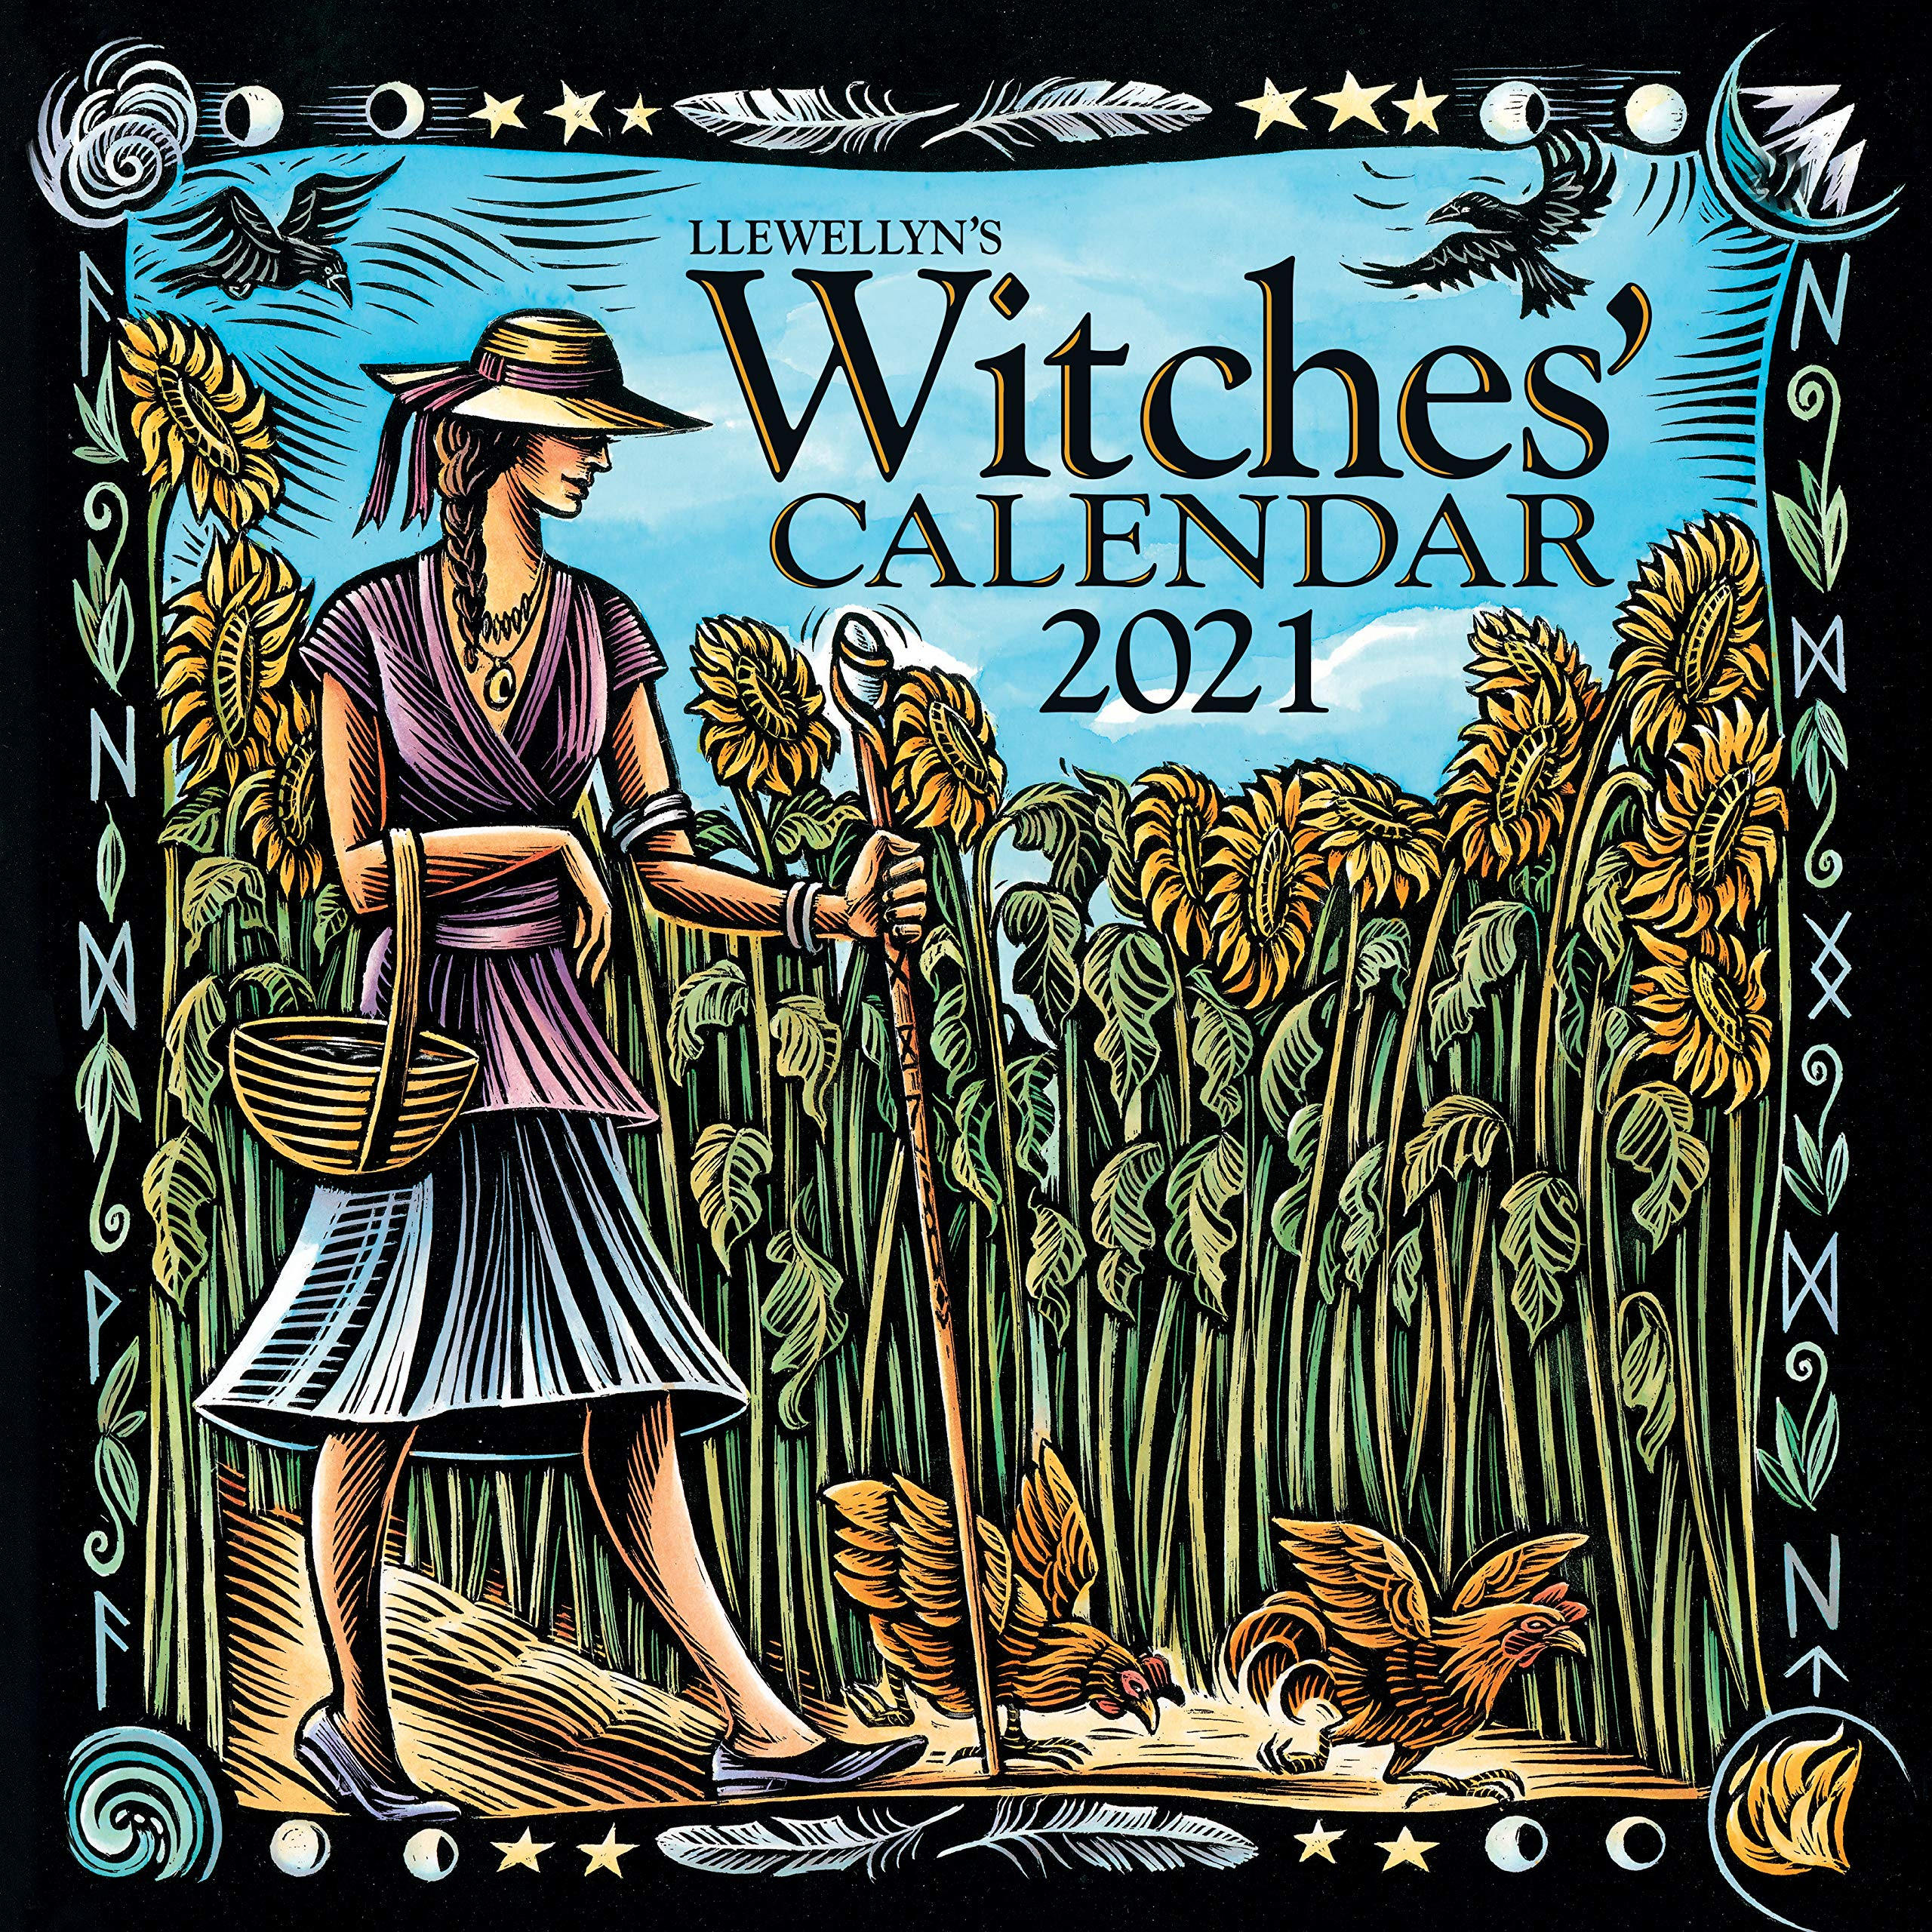 2021 Wiccan Calendar Llewellyn's 2021 Witches' Calendar: Zakroff, Laura Tempest, Zaman